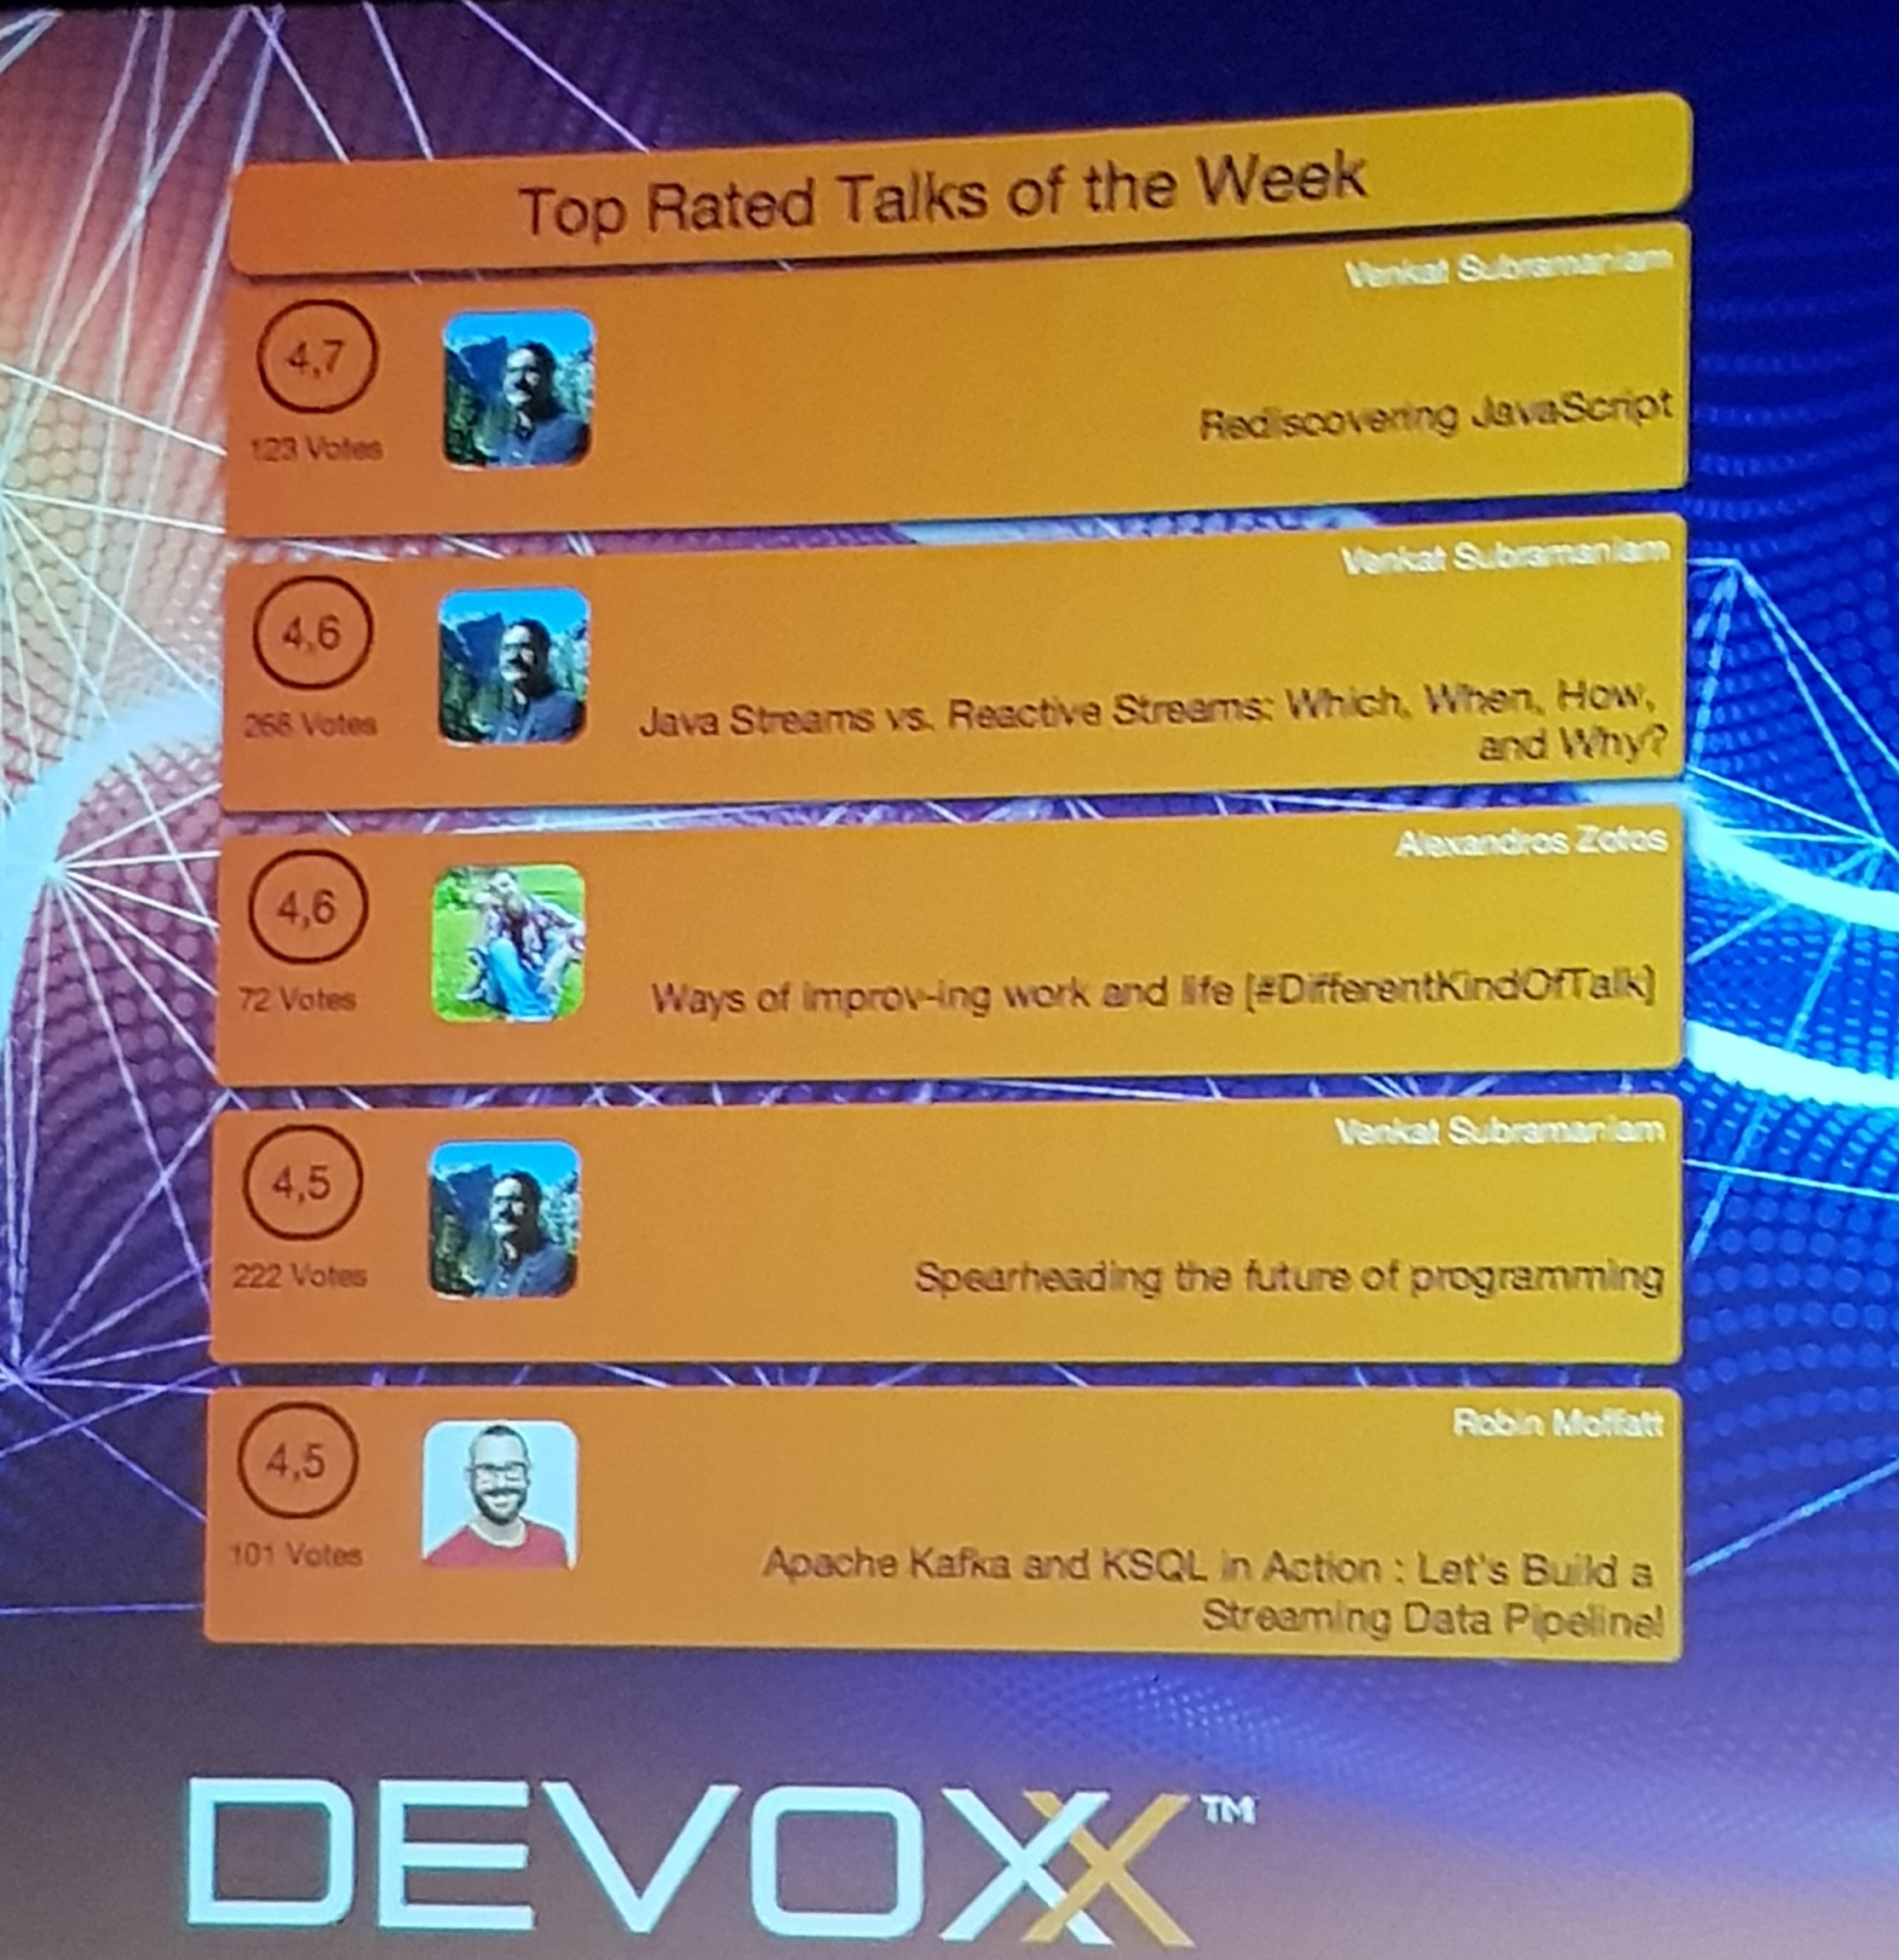 Devoxx Belgium 2018, From Developers For Developers - AMIS